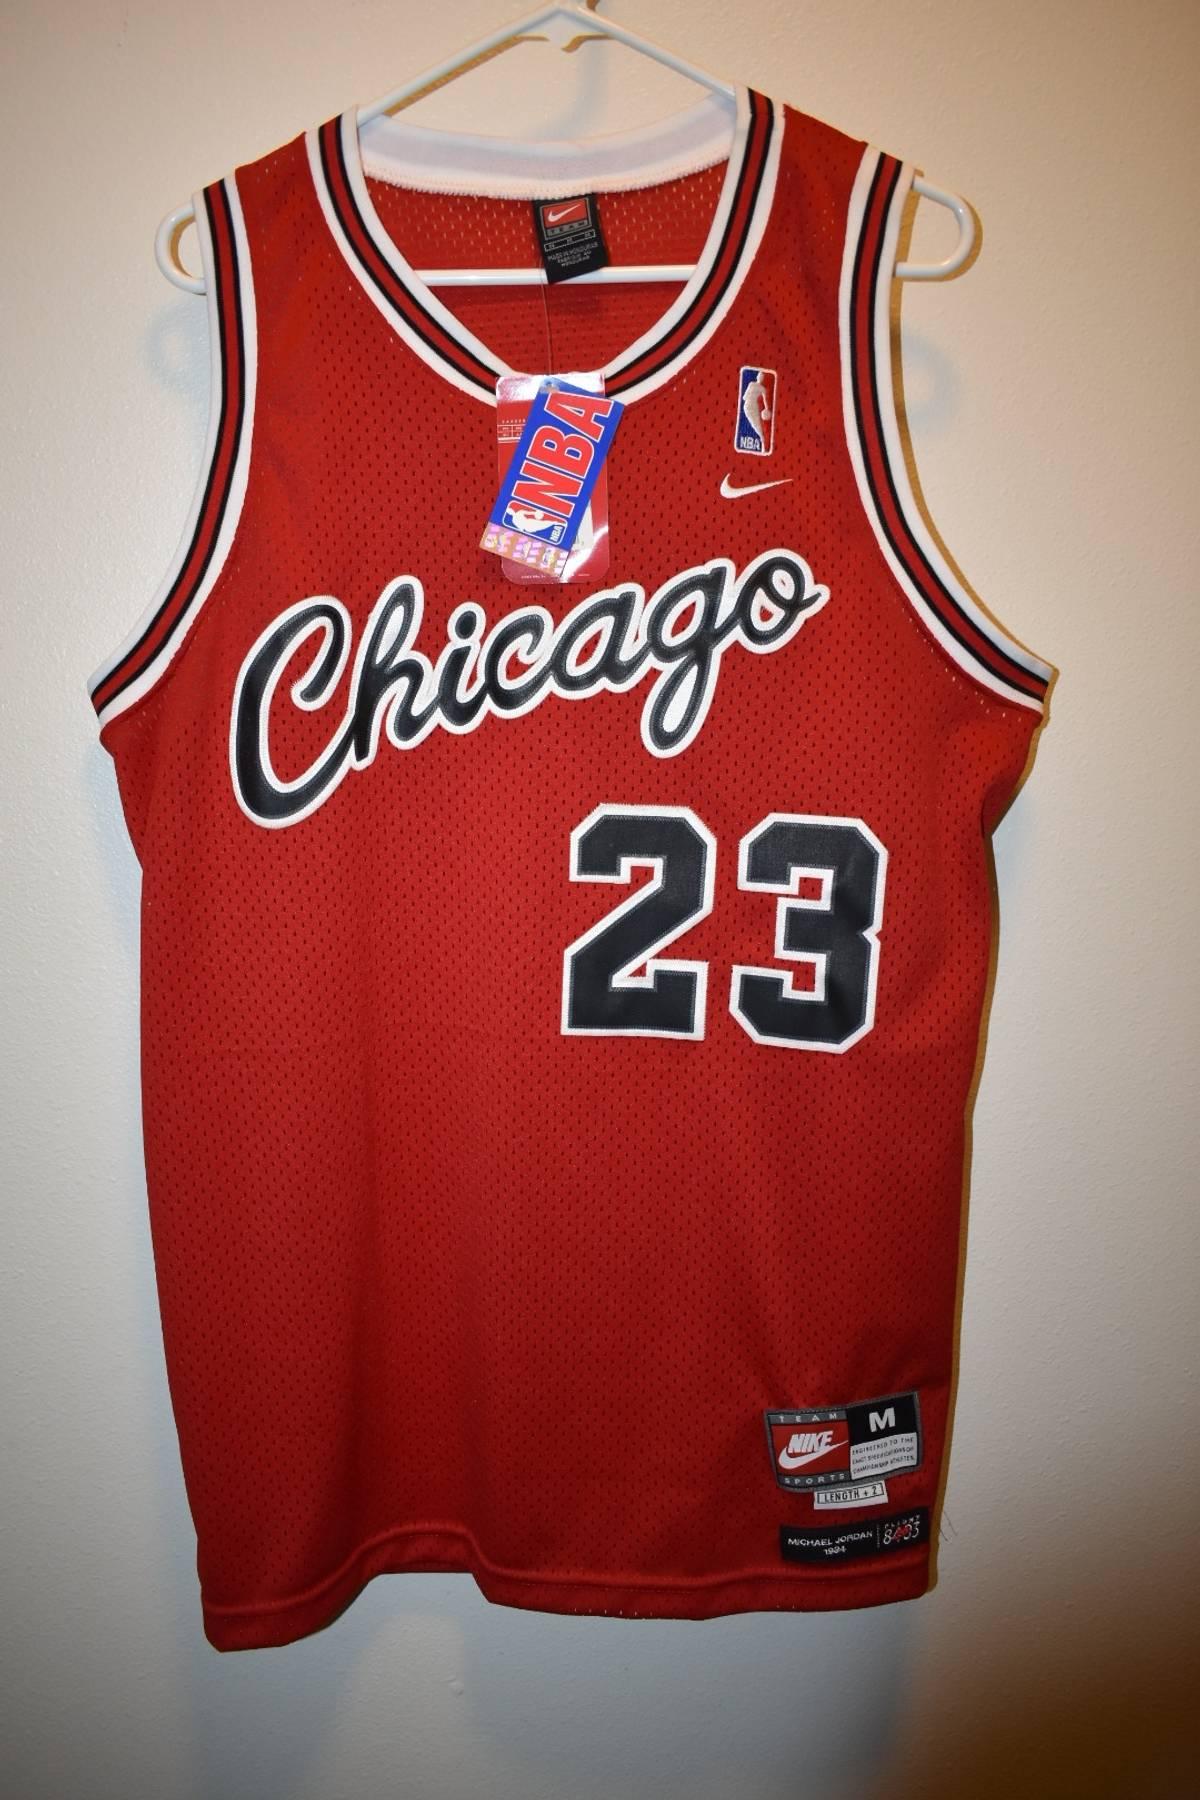 innovative design 31163 8f39f Nike Nike Jordan Jersey Size M $54